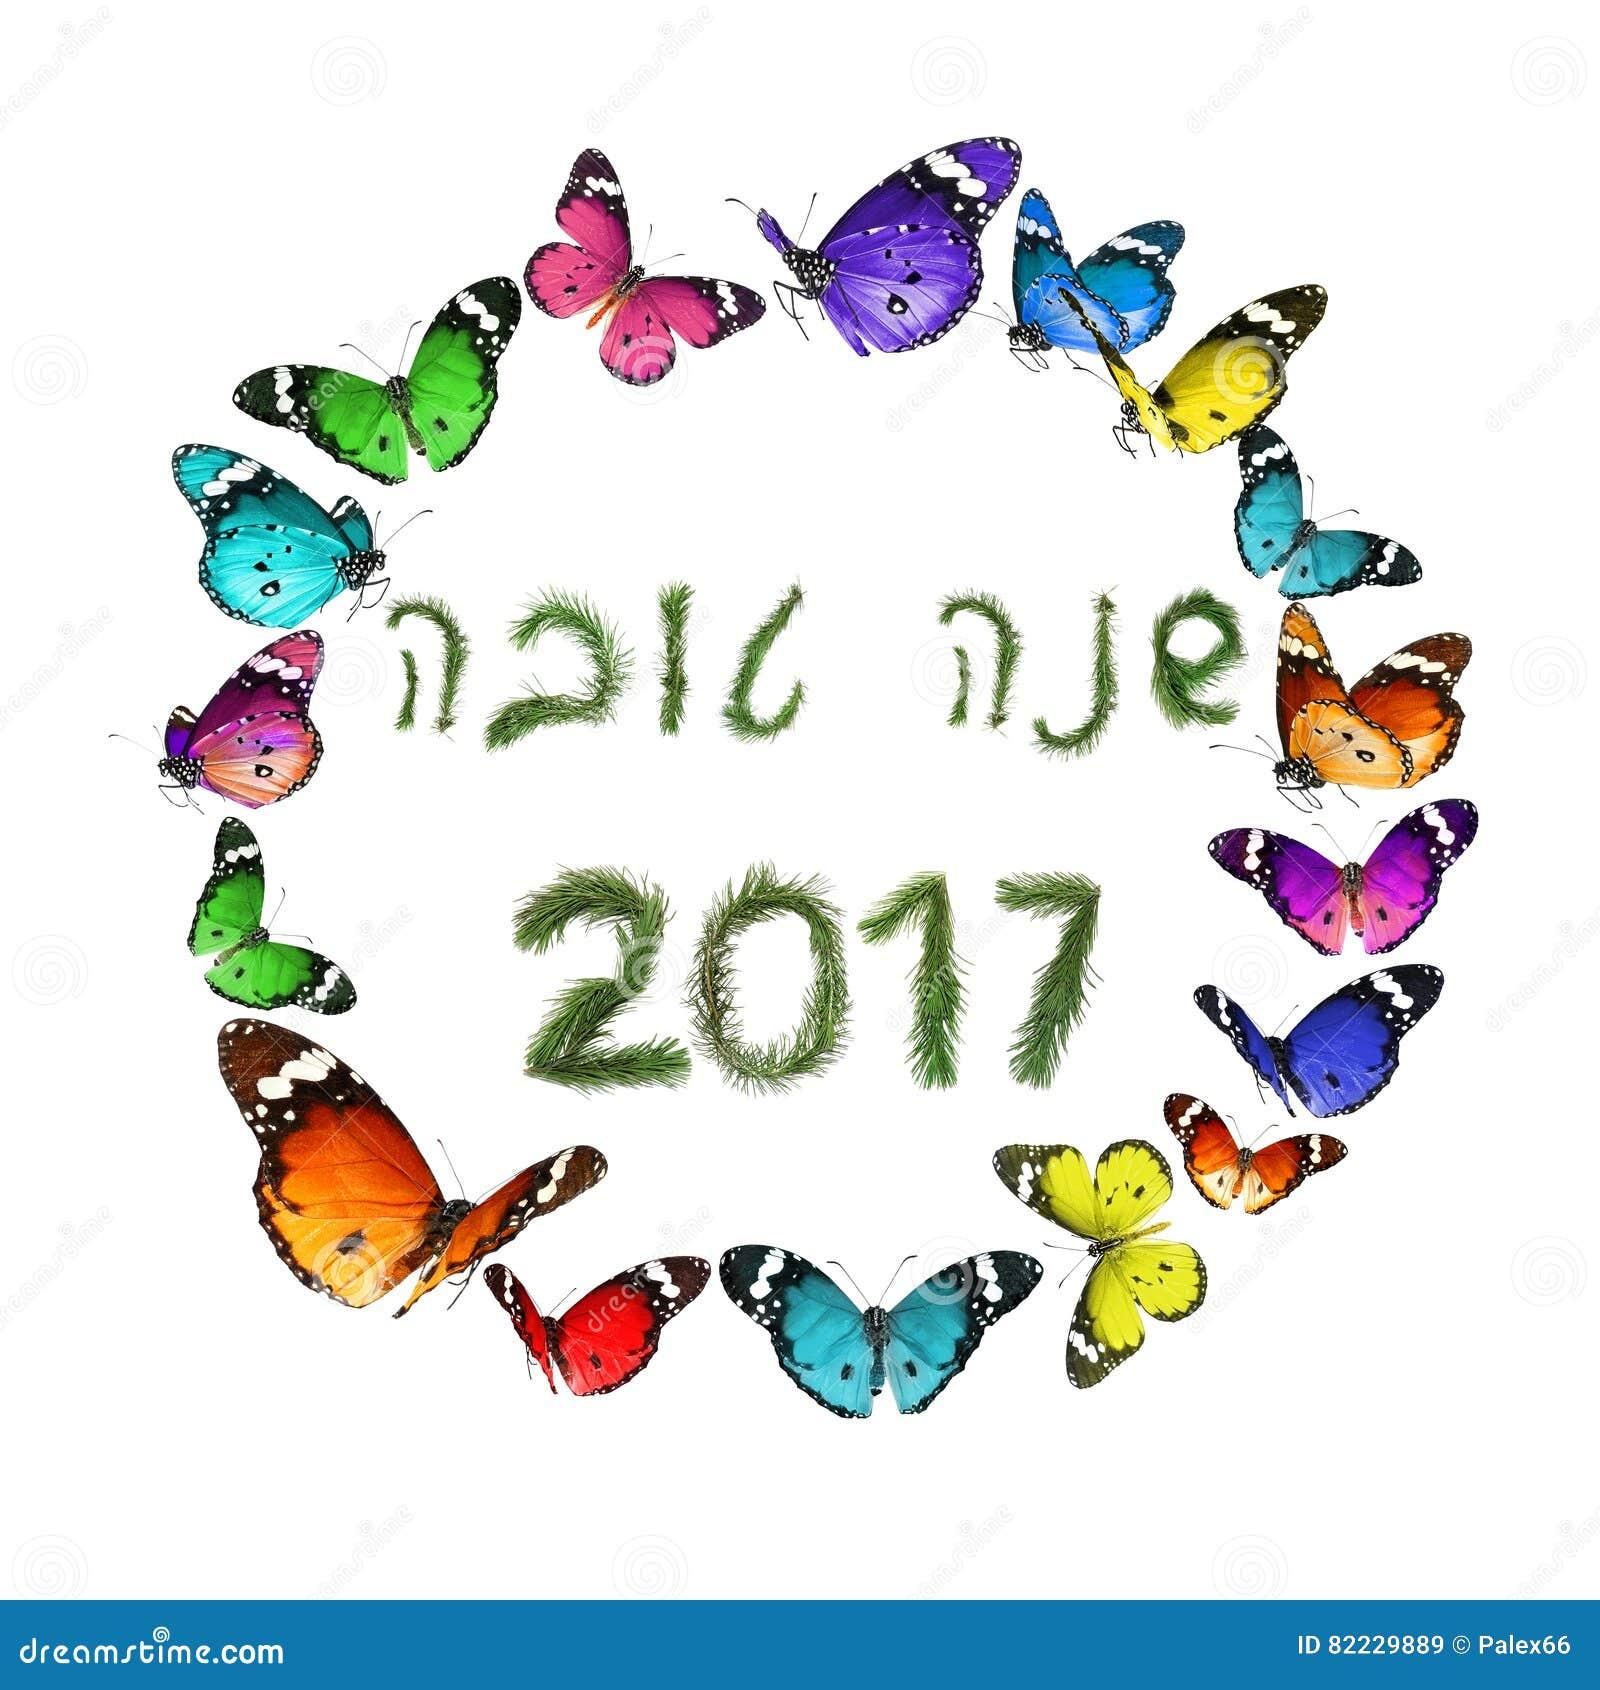 New year 2017 hebrew greeting words shana tova happy new year royalty free stock photo kristyandbryce Images